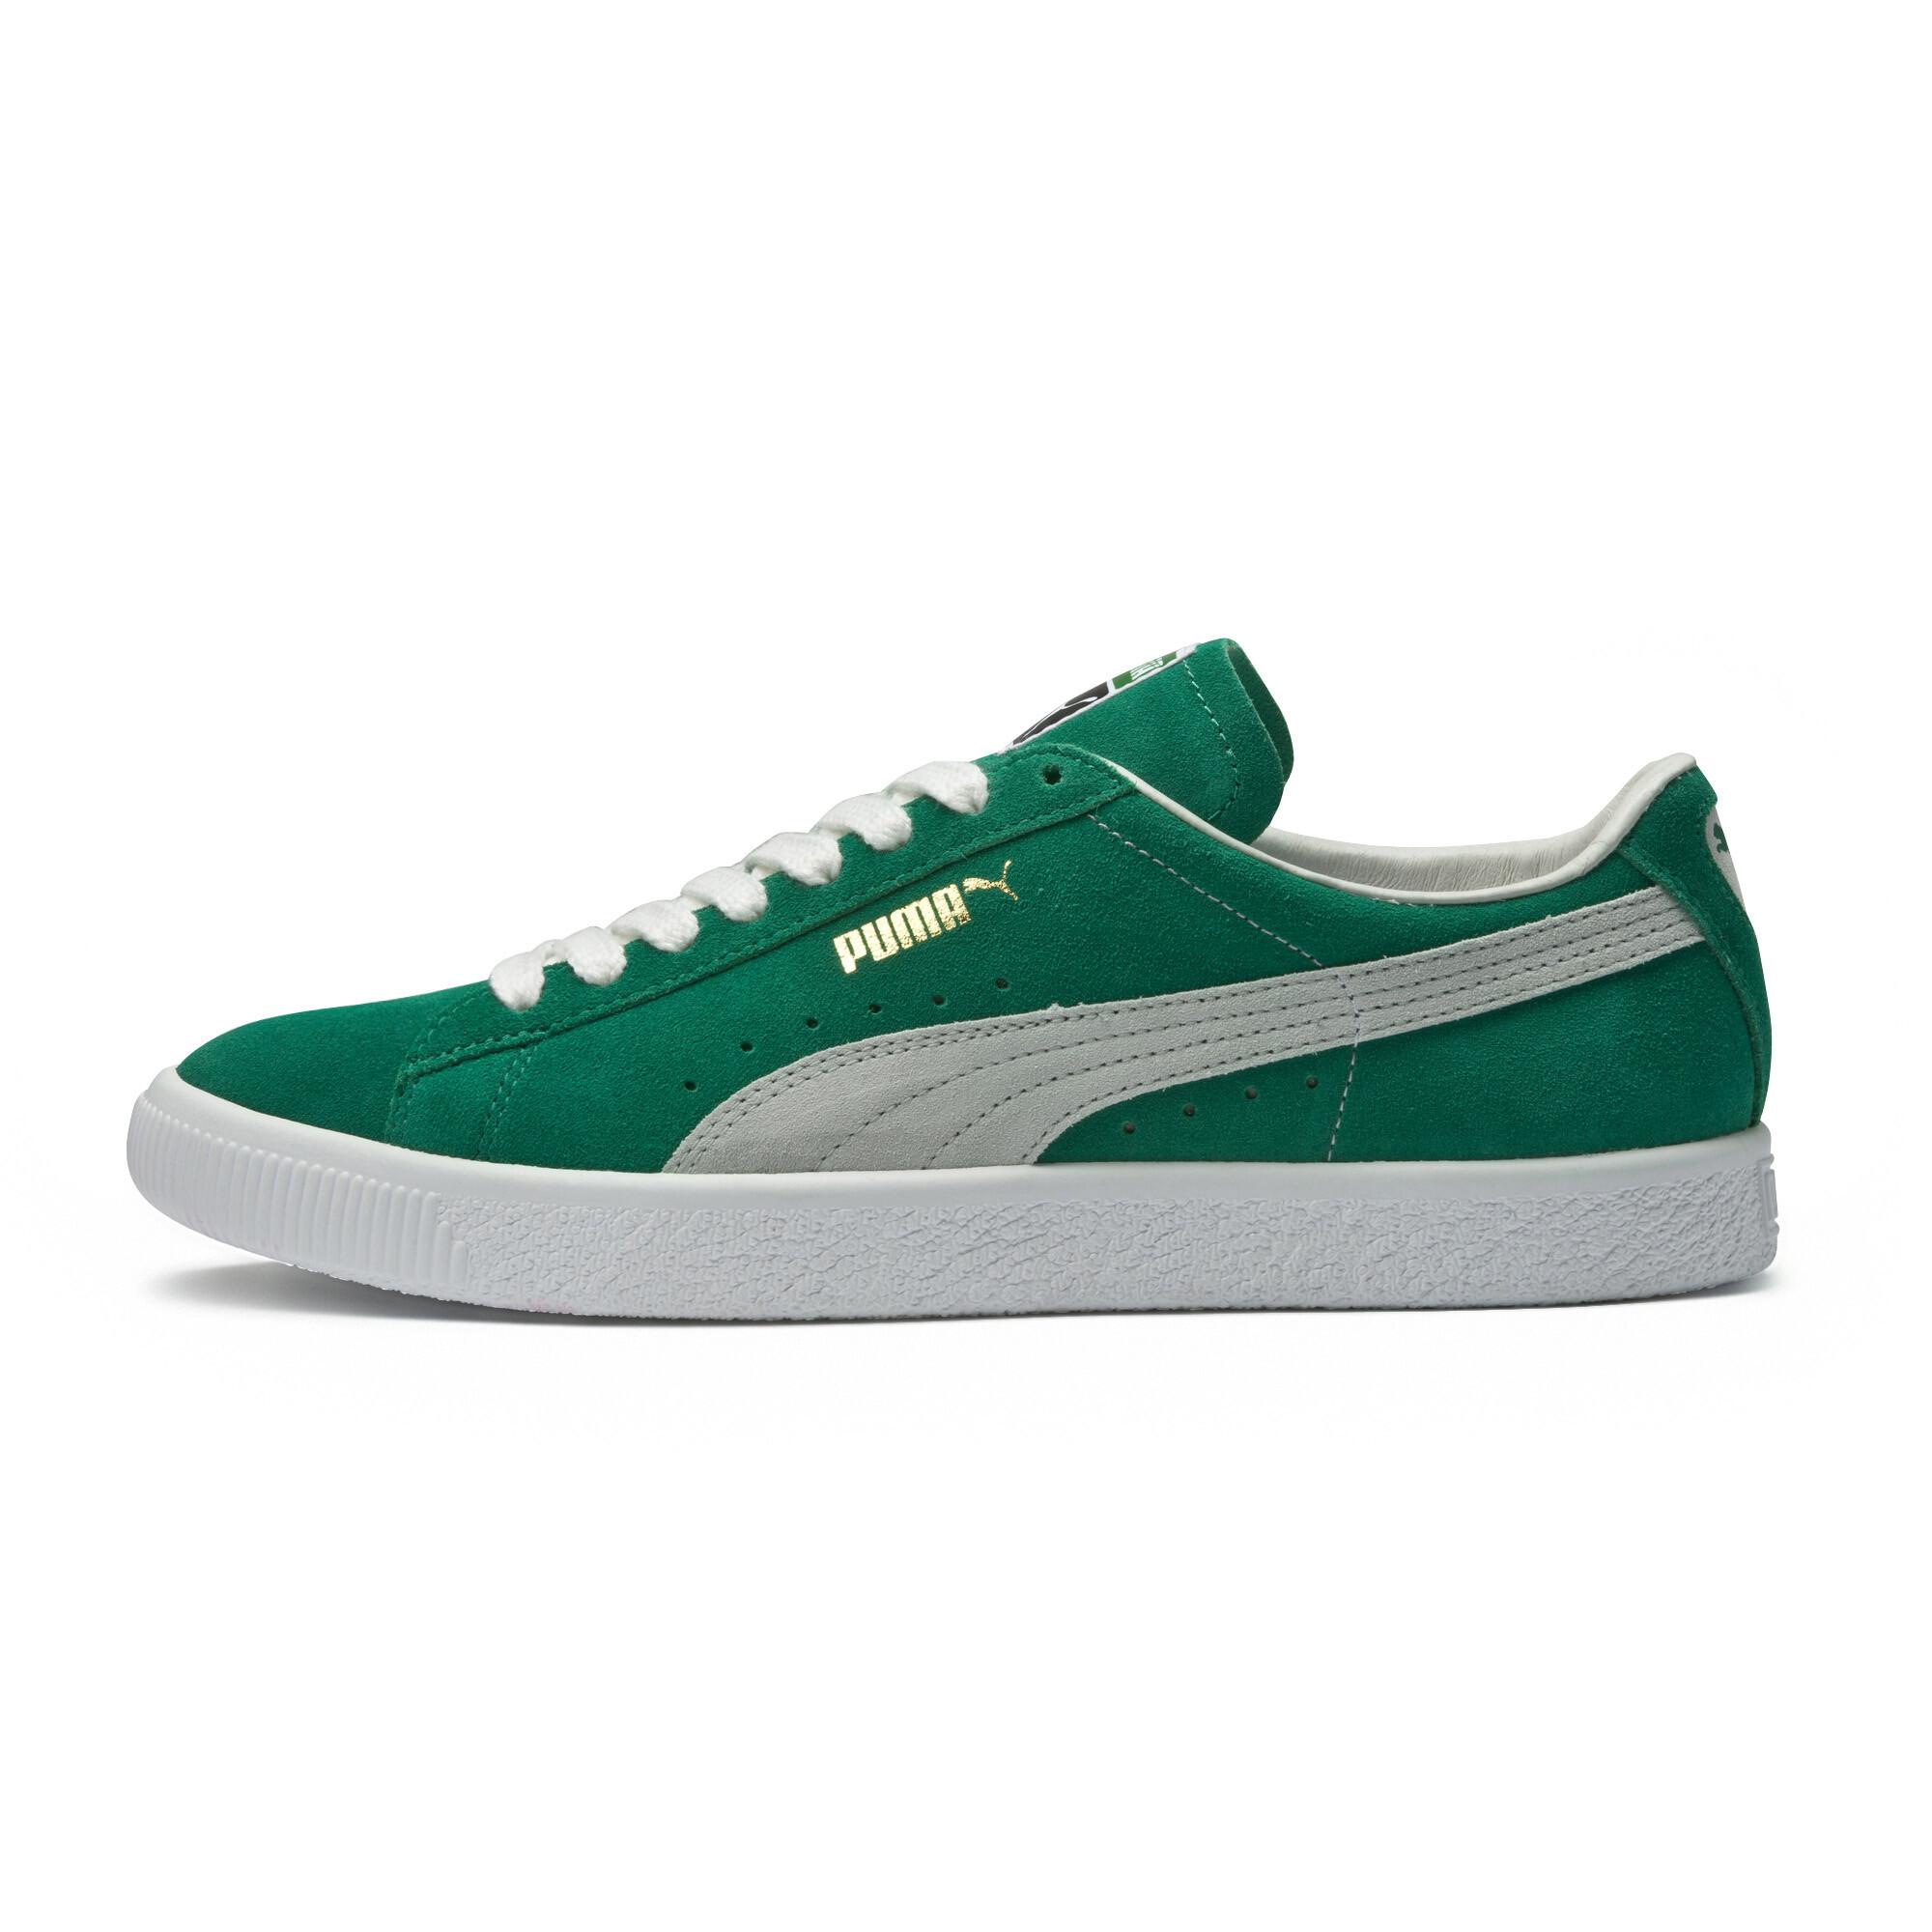 Image Puma Suede 90681 Sneakers #6